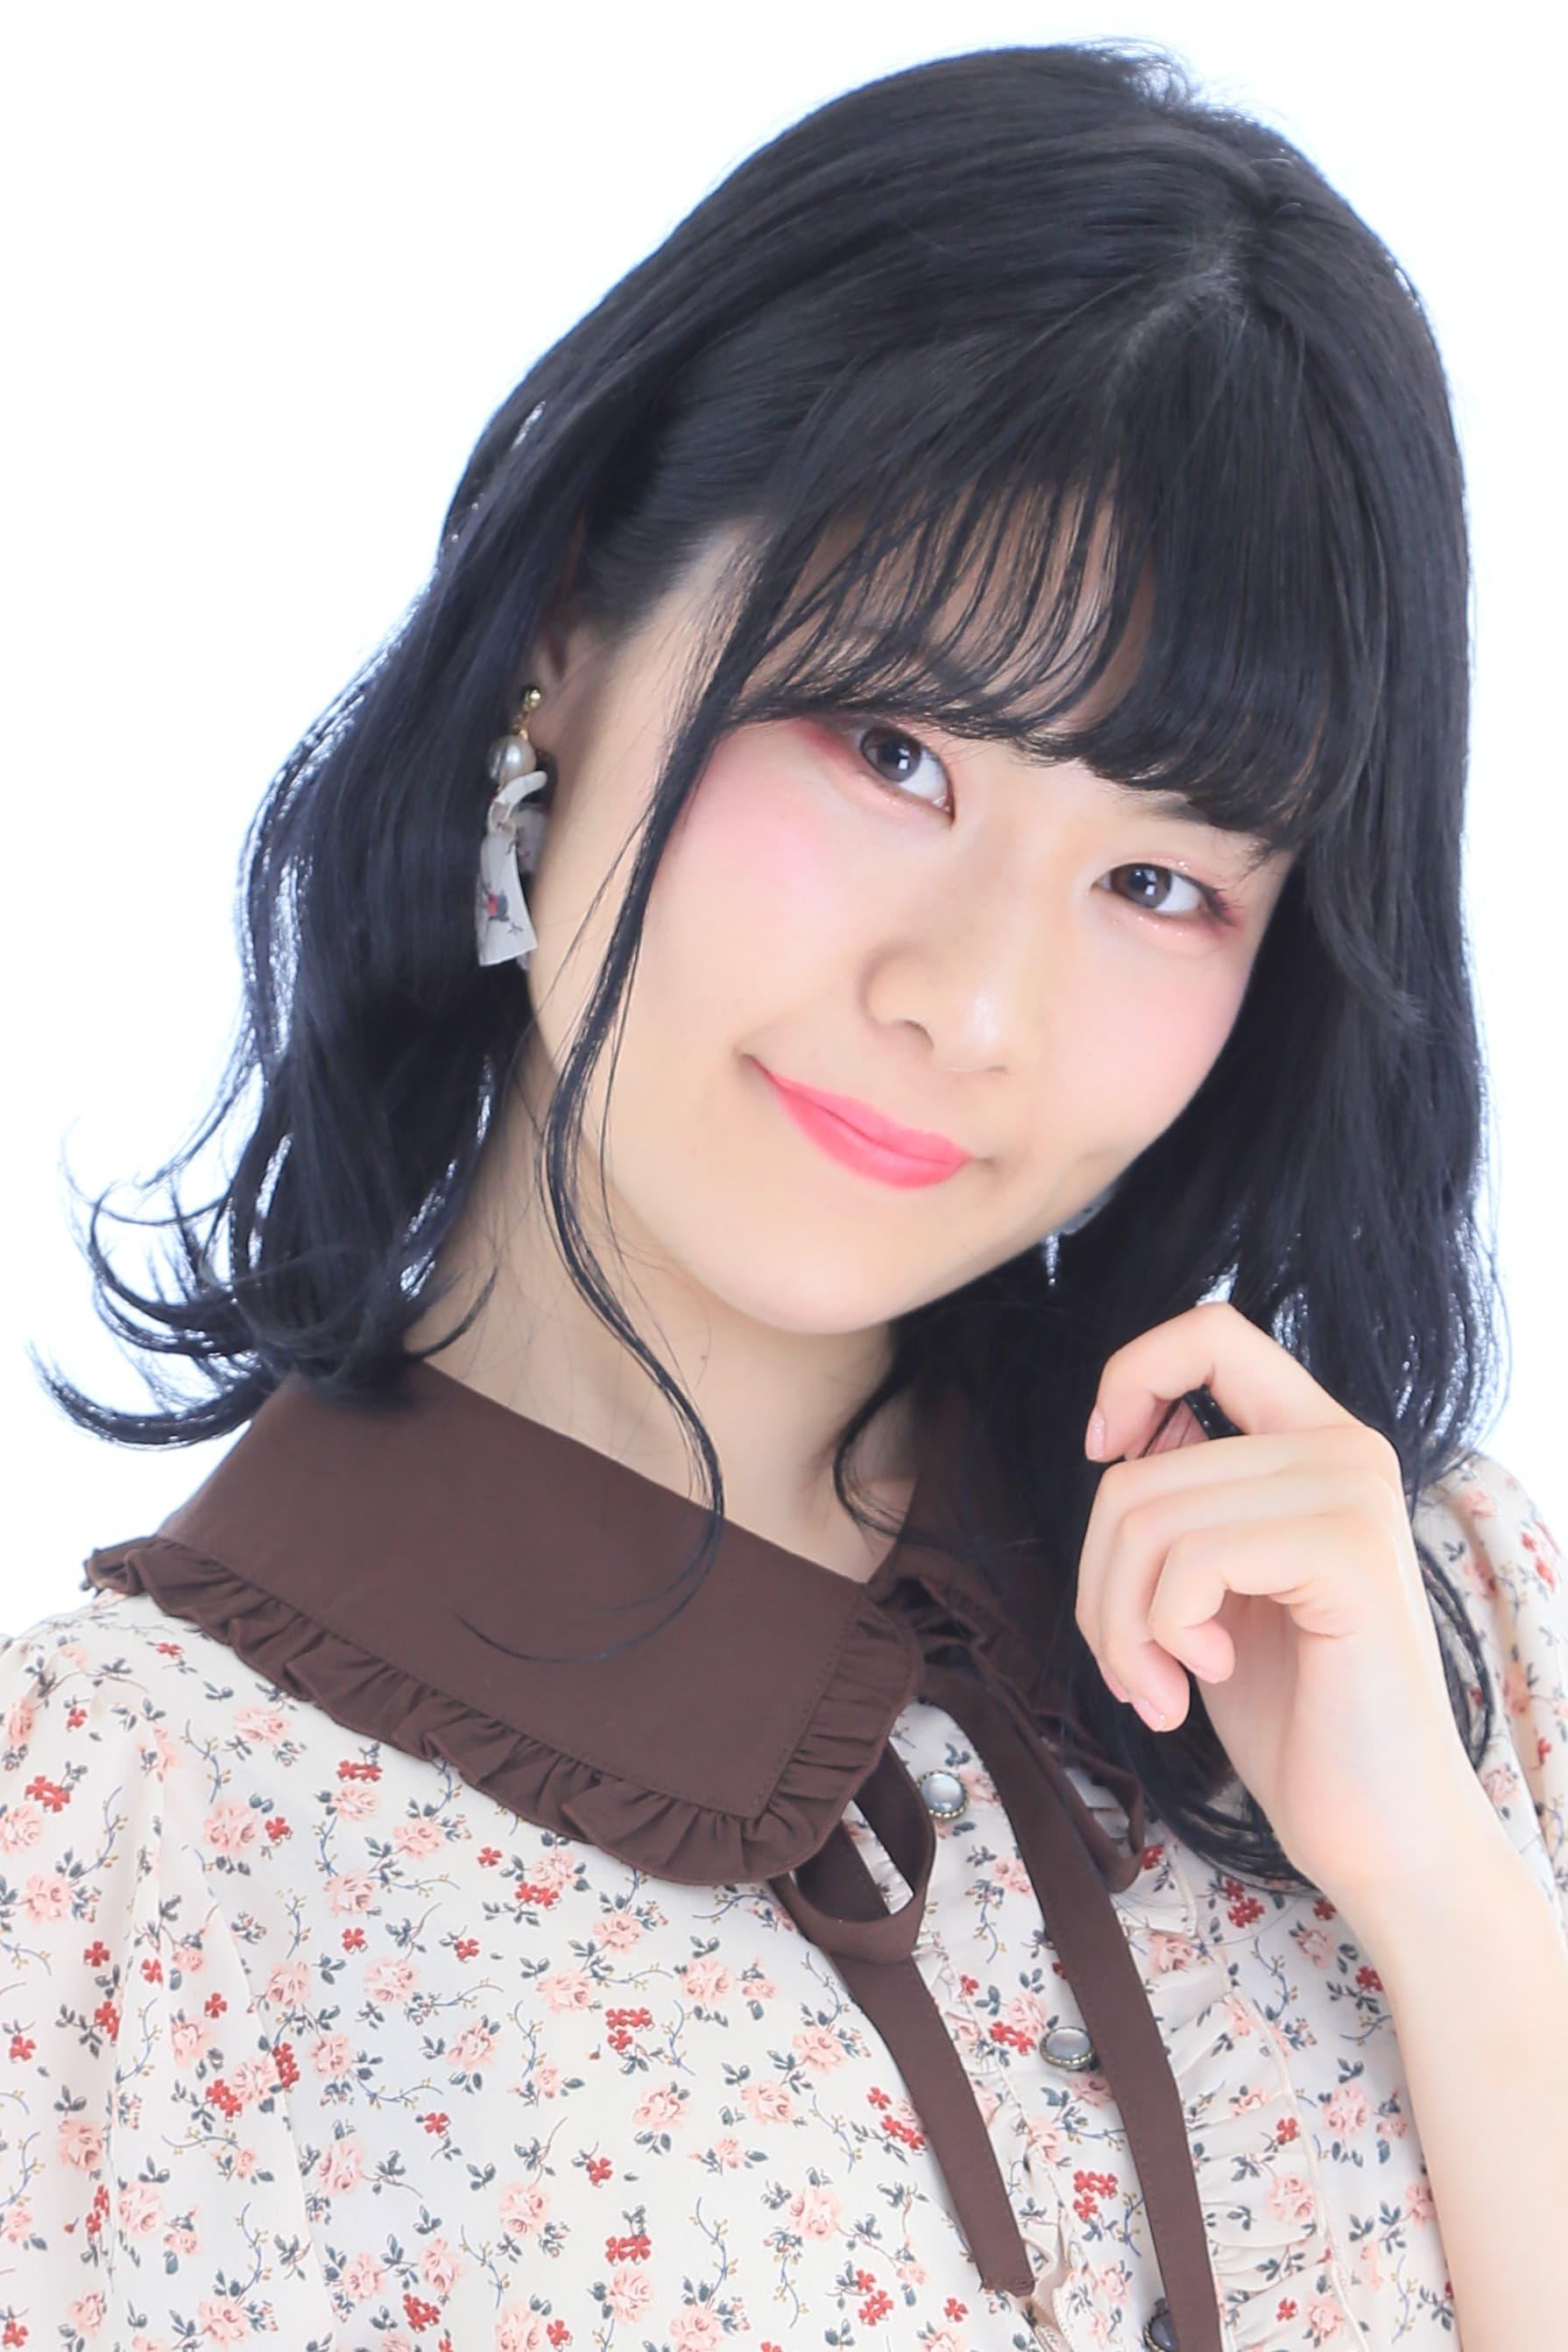 Yuriko Hanamiya